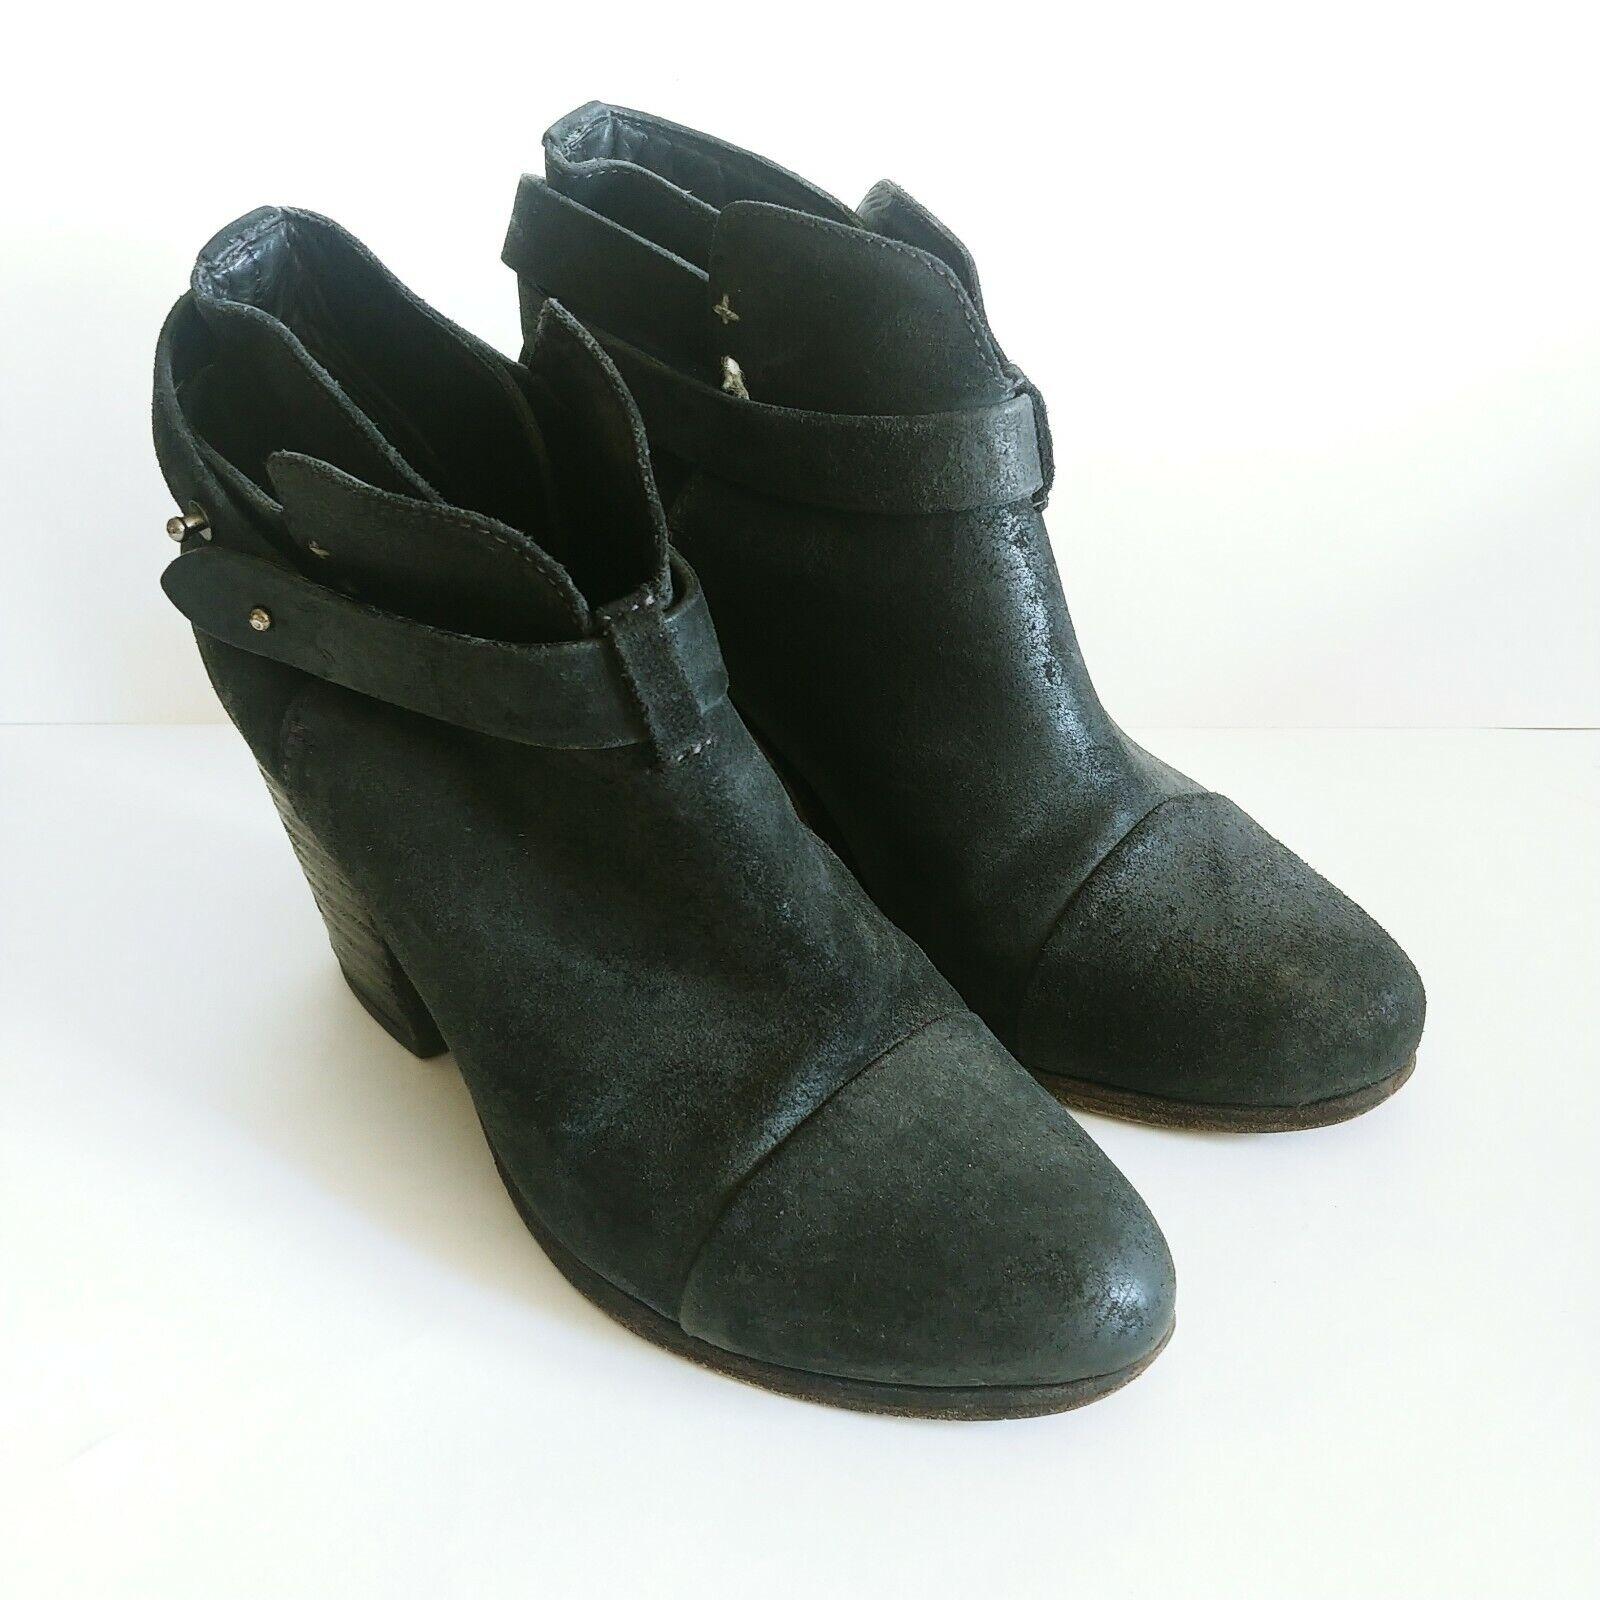 Rag & Bone Women's 39 Eur/9 US Harrow Suede Ankle Booties Boots Black